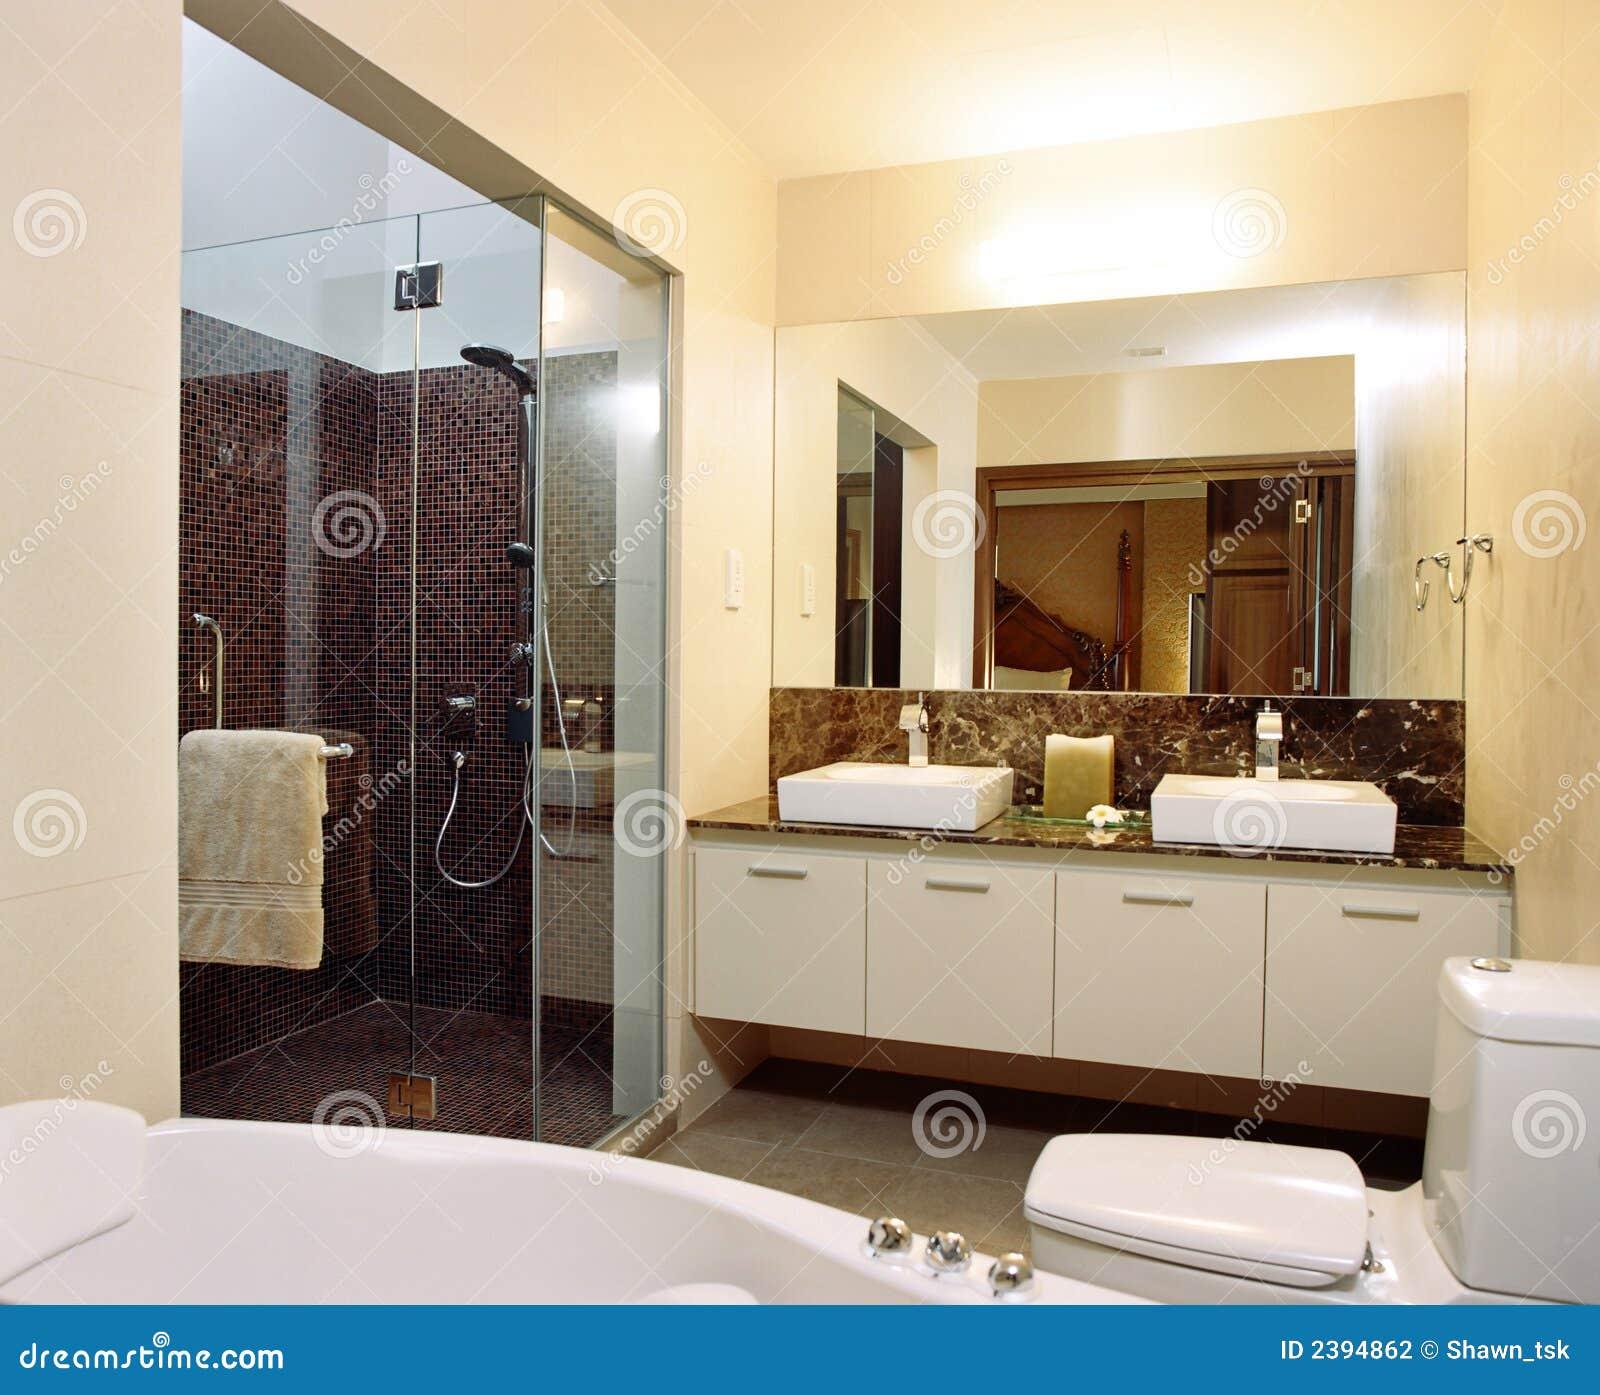 Dise o interior cuarto de ba o foto de archivo imagen Diseno de interiores recamara principal